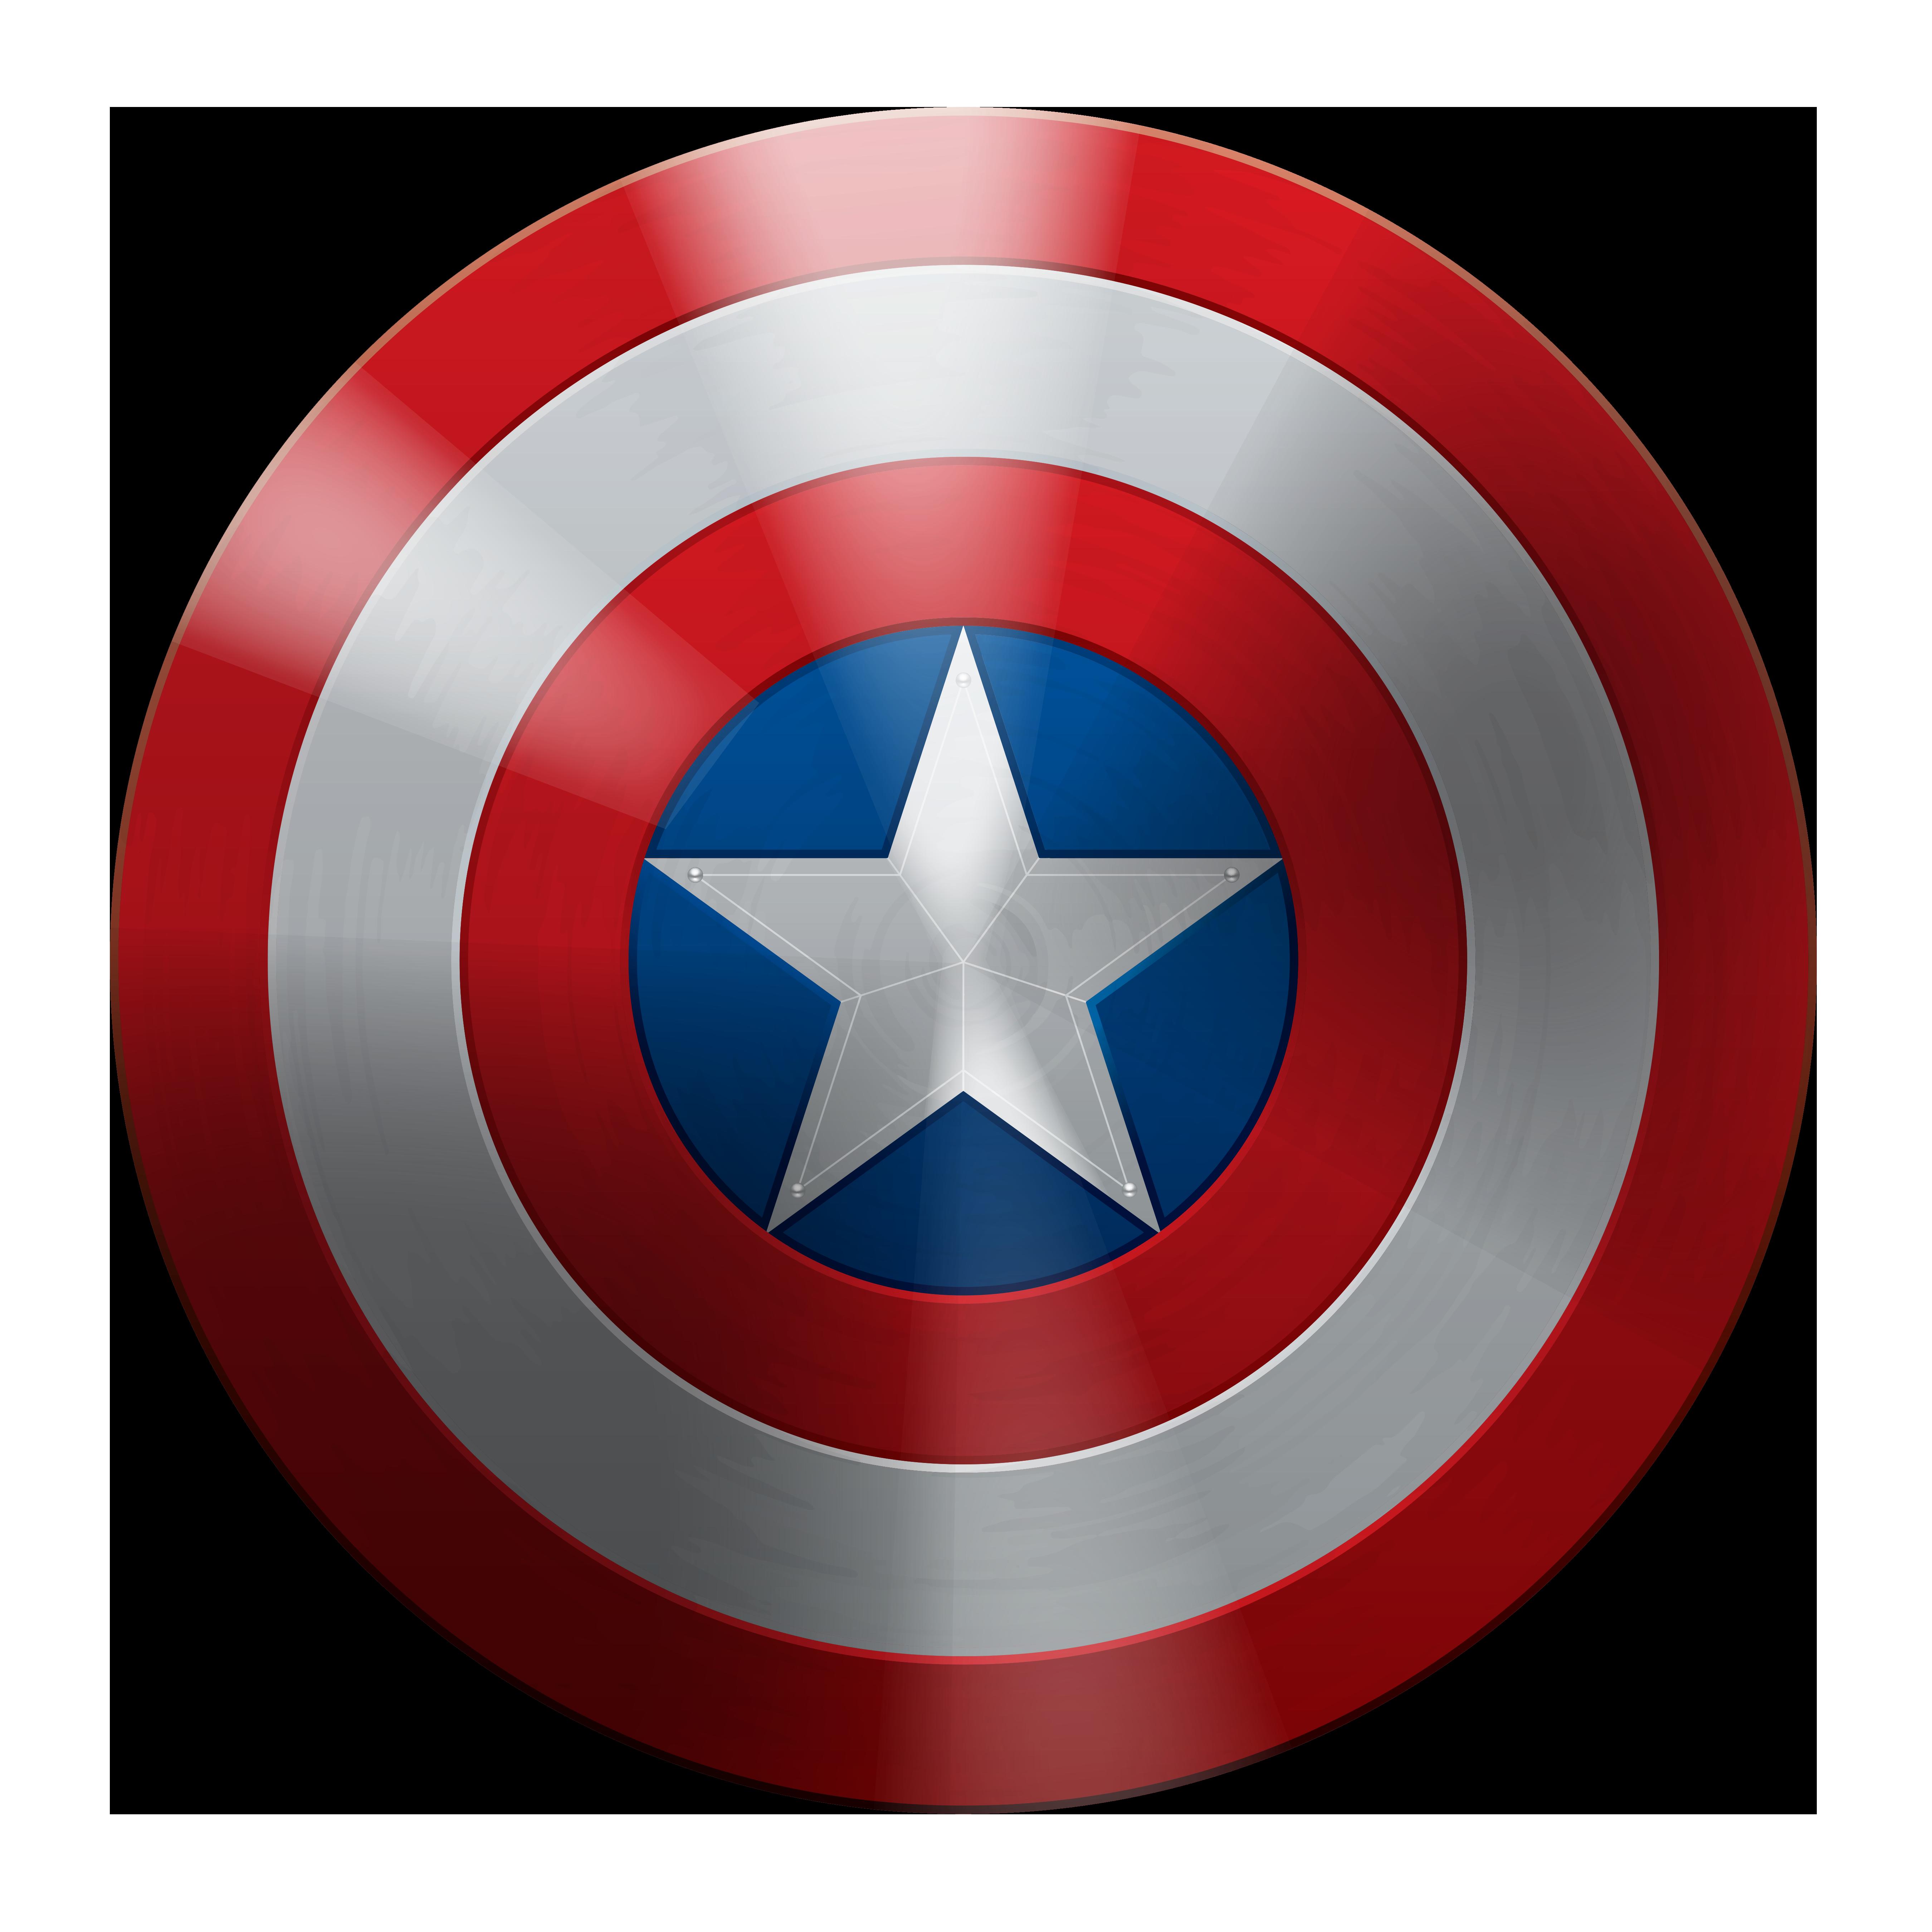 Good Shield Proporations Escudo Capitao America Desenho Capitao America Png Capitao America Desenho